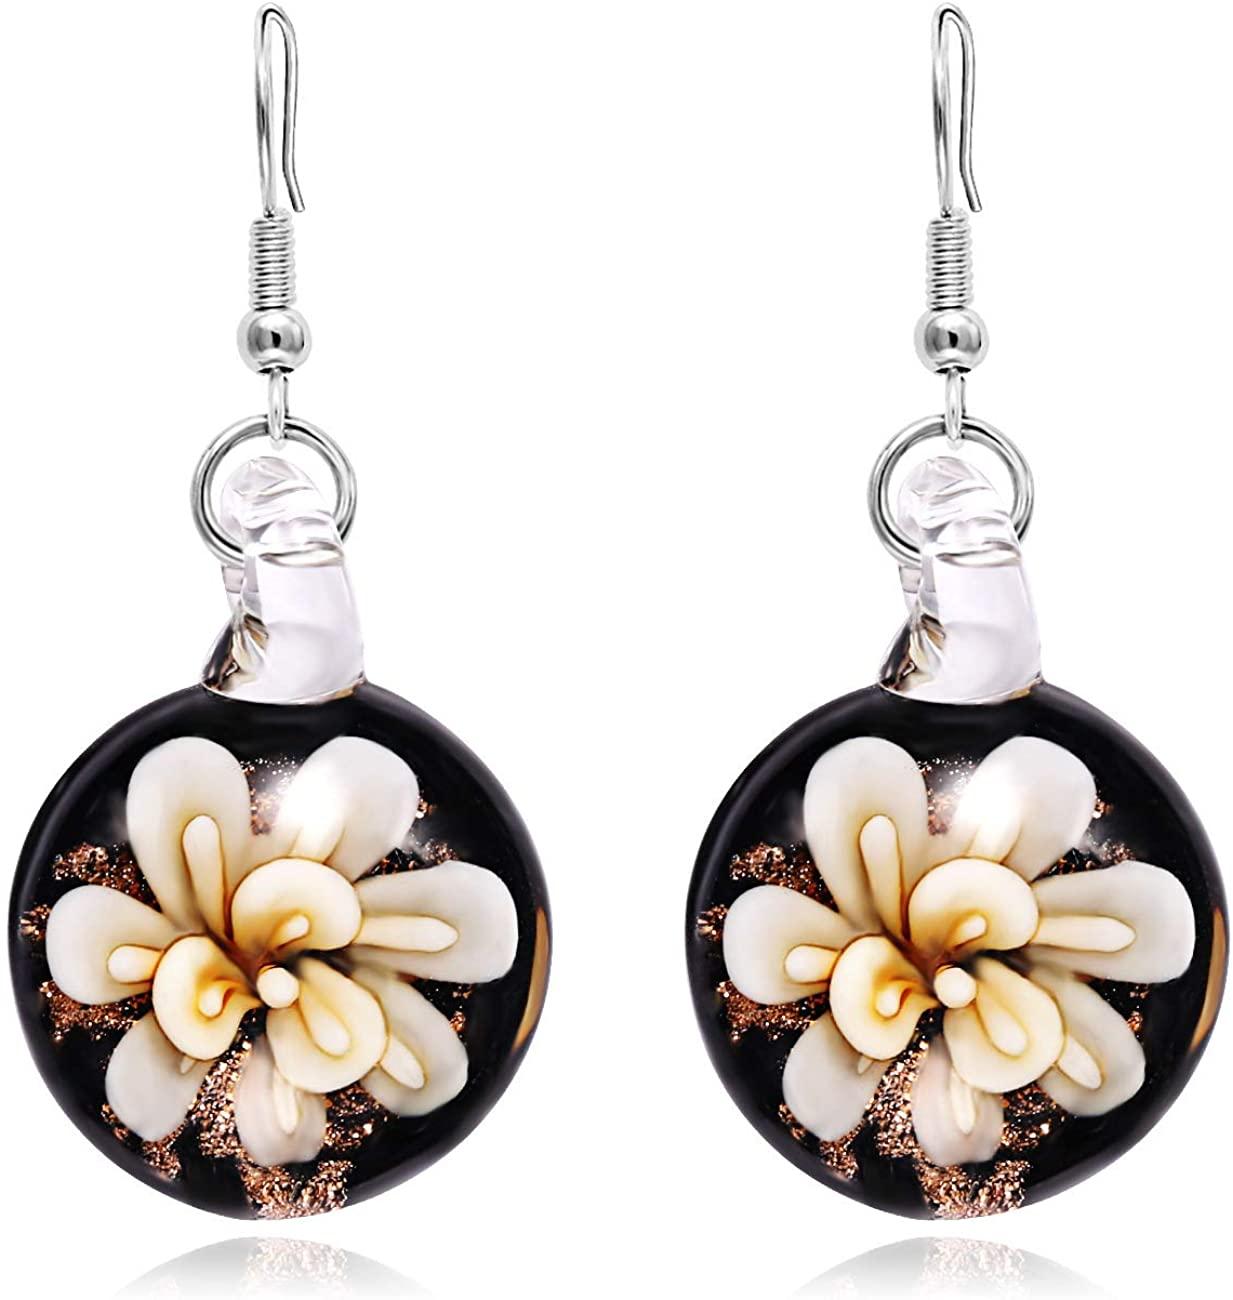 VEINTI+1 Exotic Style Eye-catcher Handmade Circle Shape Black Base with Flower Design Colorful Glass Earrings